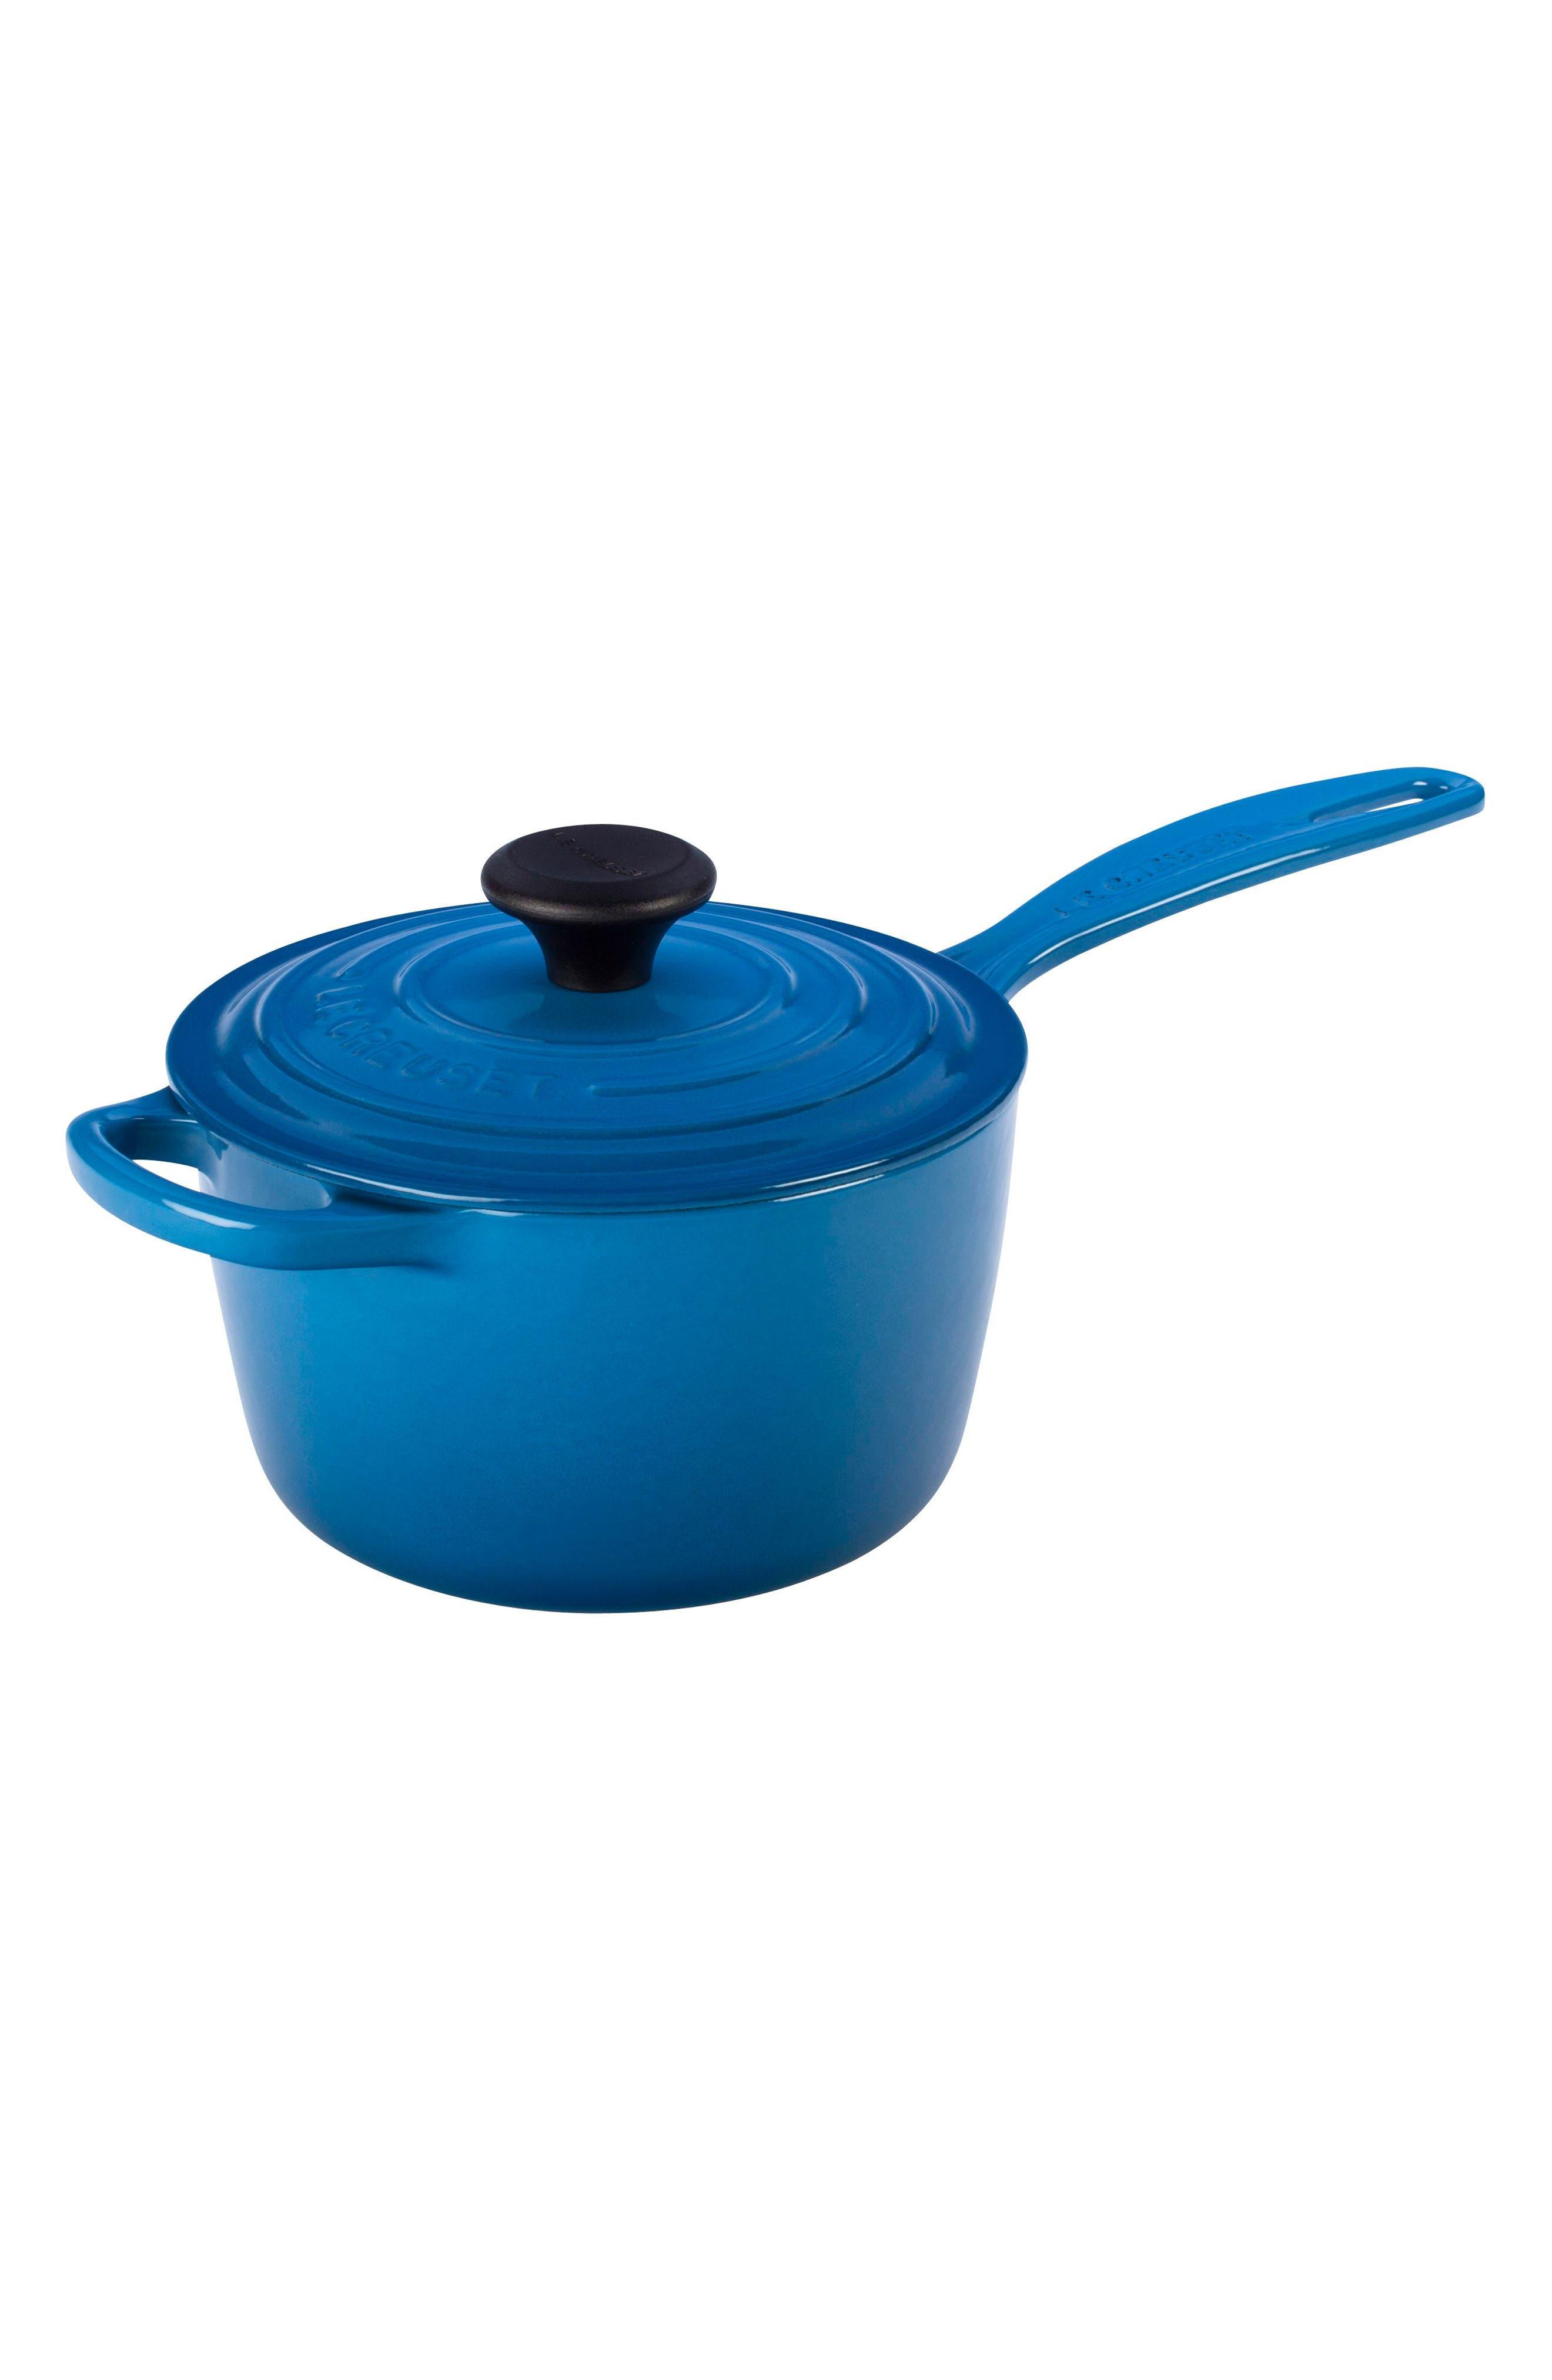 Pots Cookware, Bakeware, Pots & Pans | Nordstrom